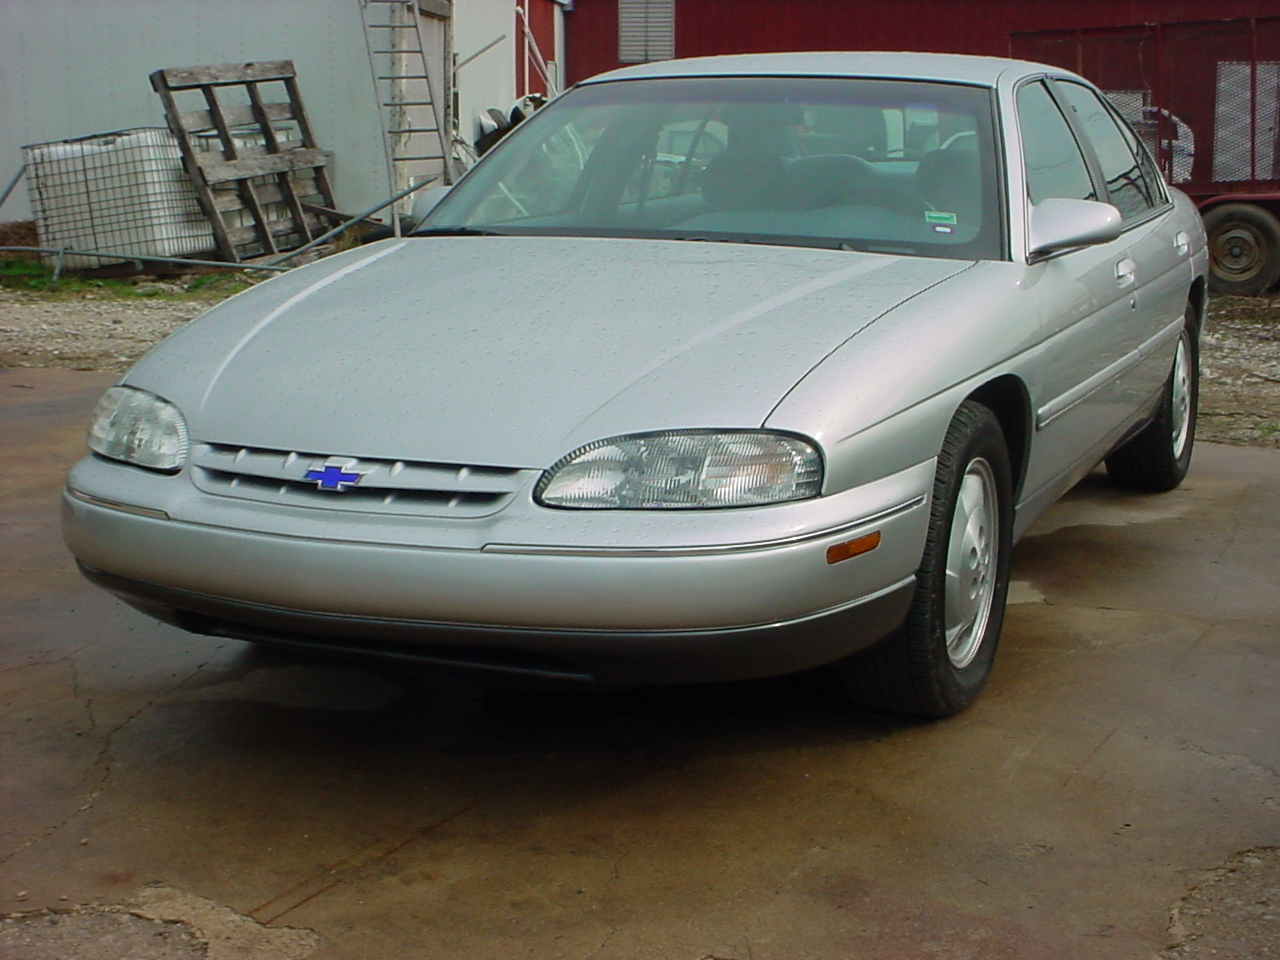 Chevrolet lumina v6